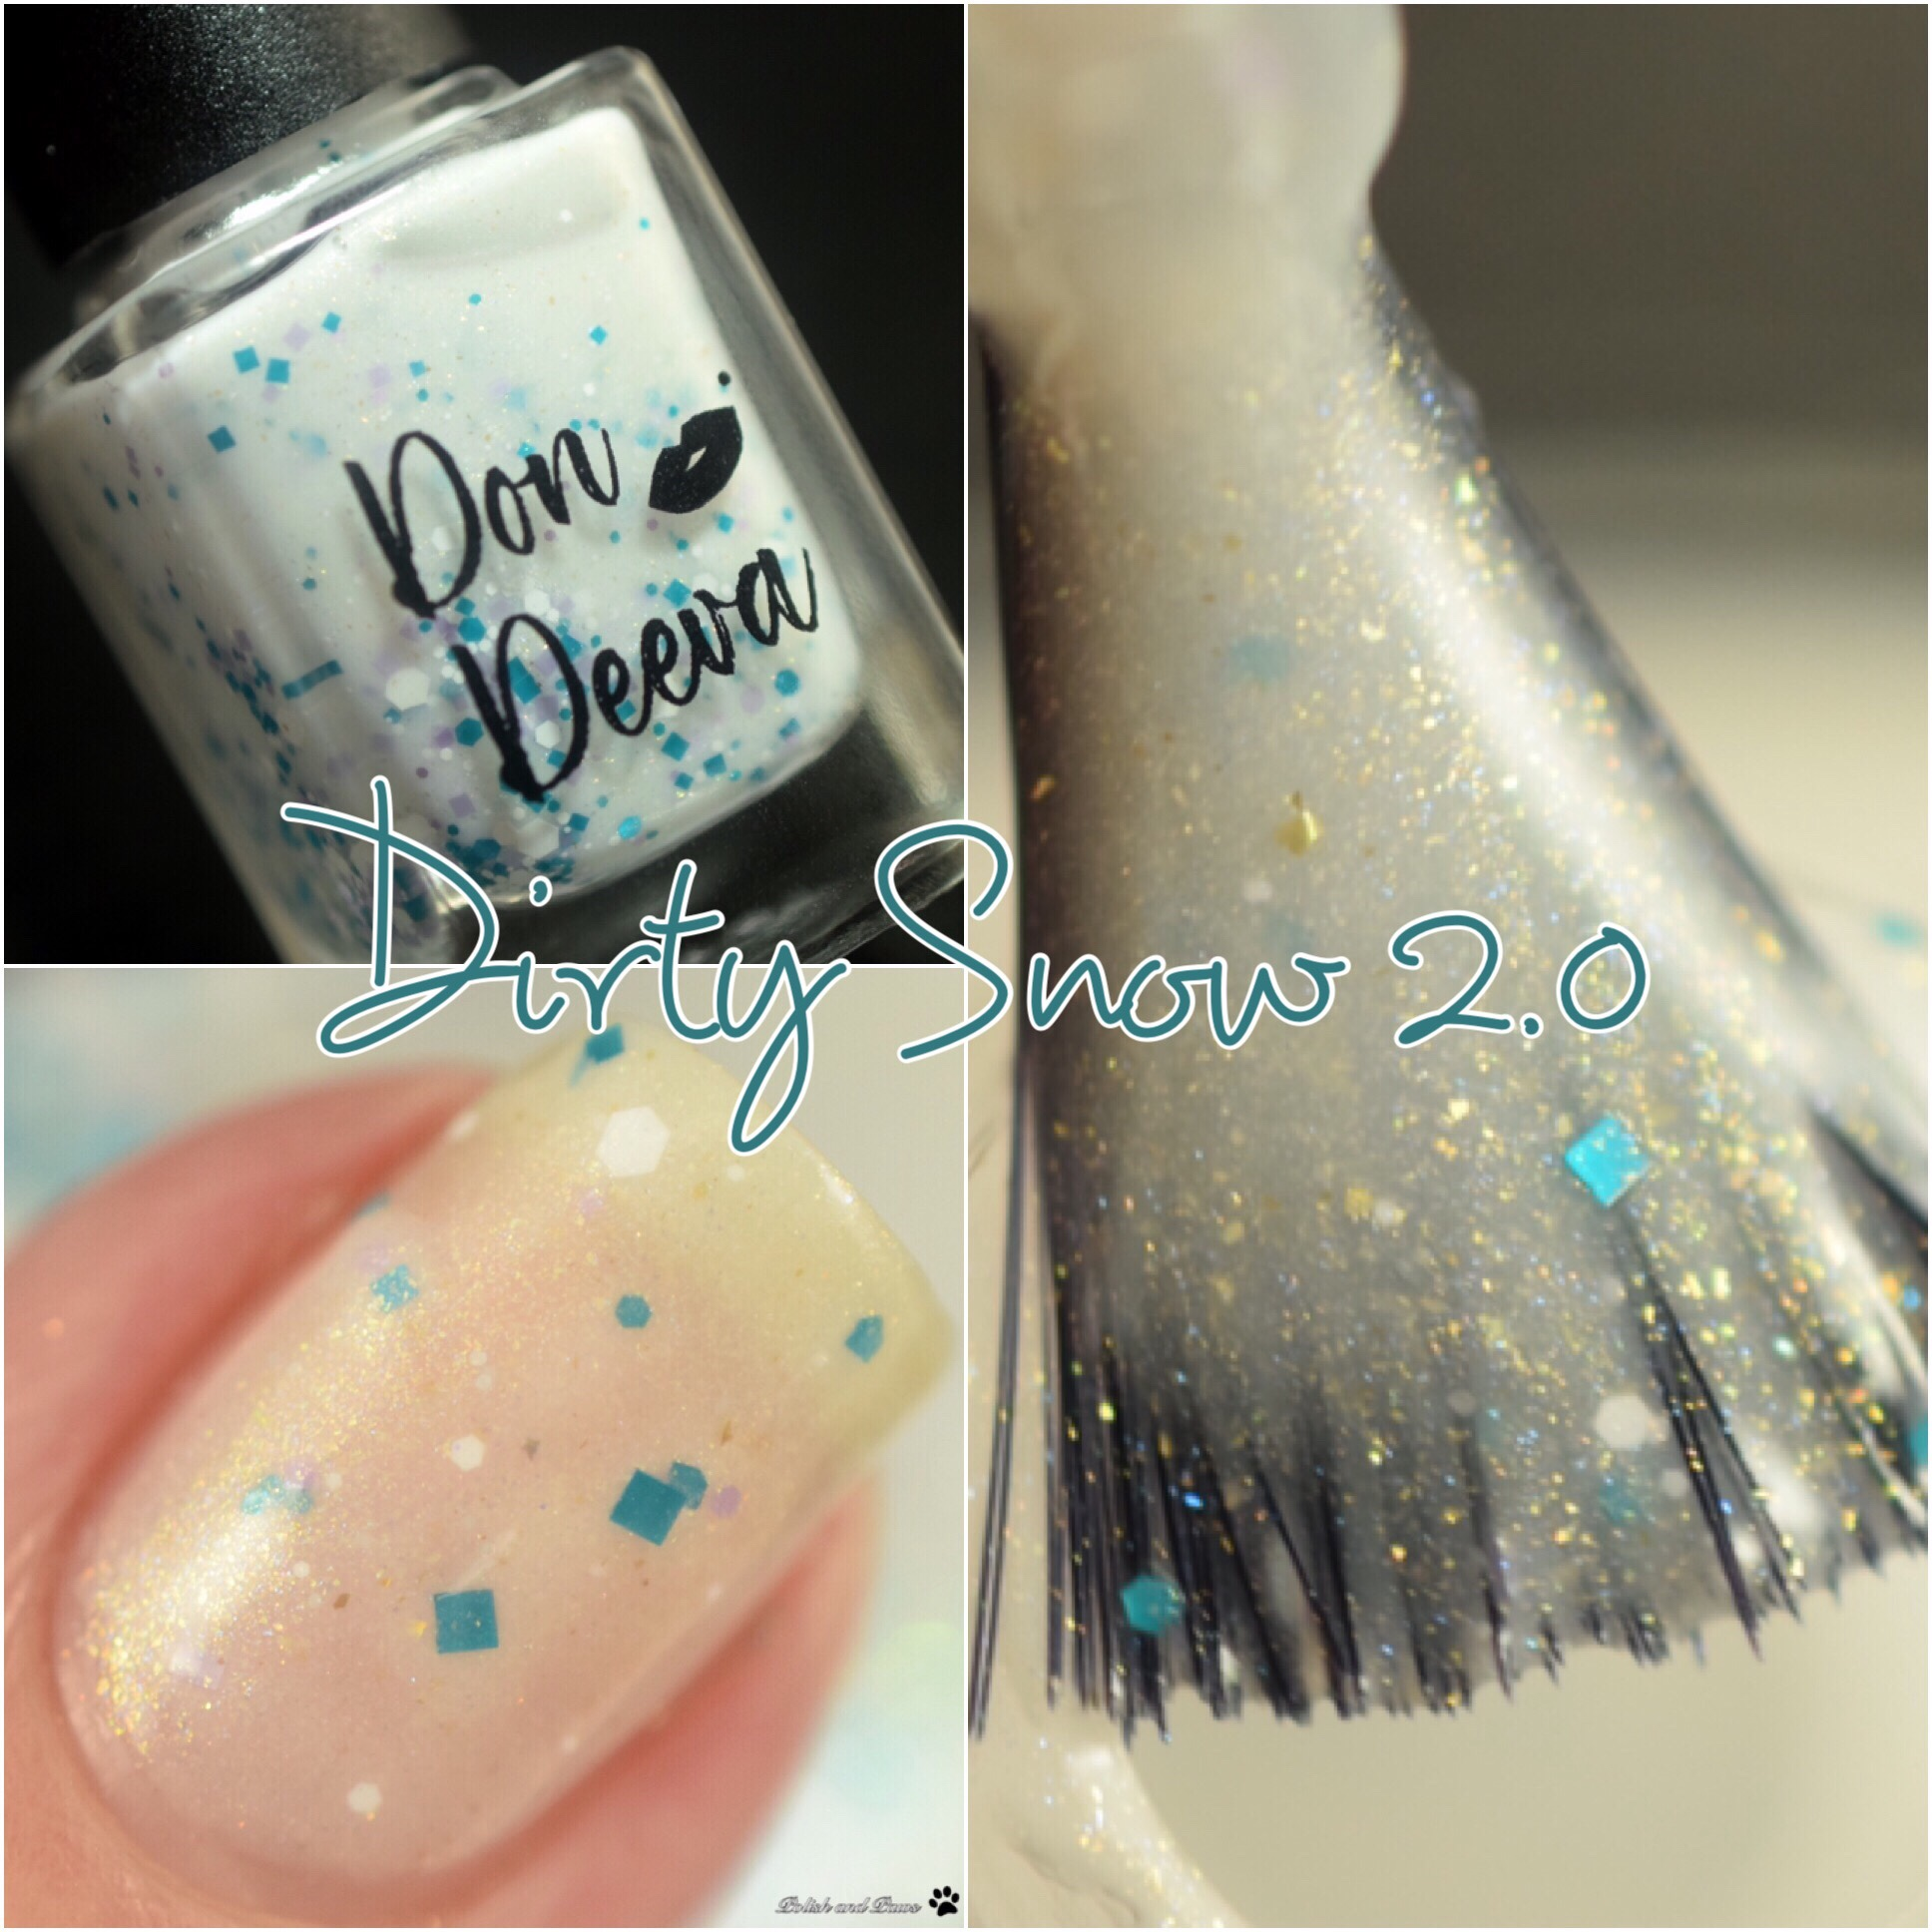 Don Deeva Dirty Snow